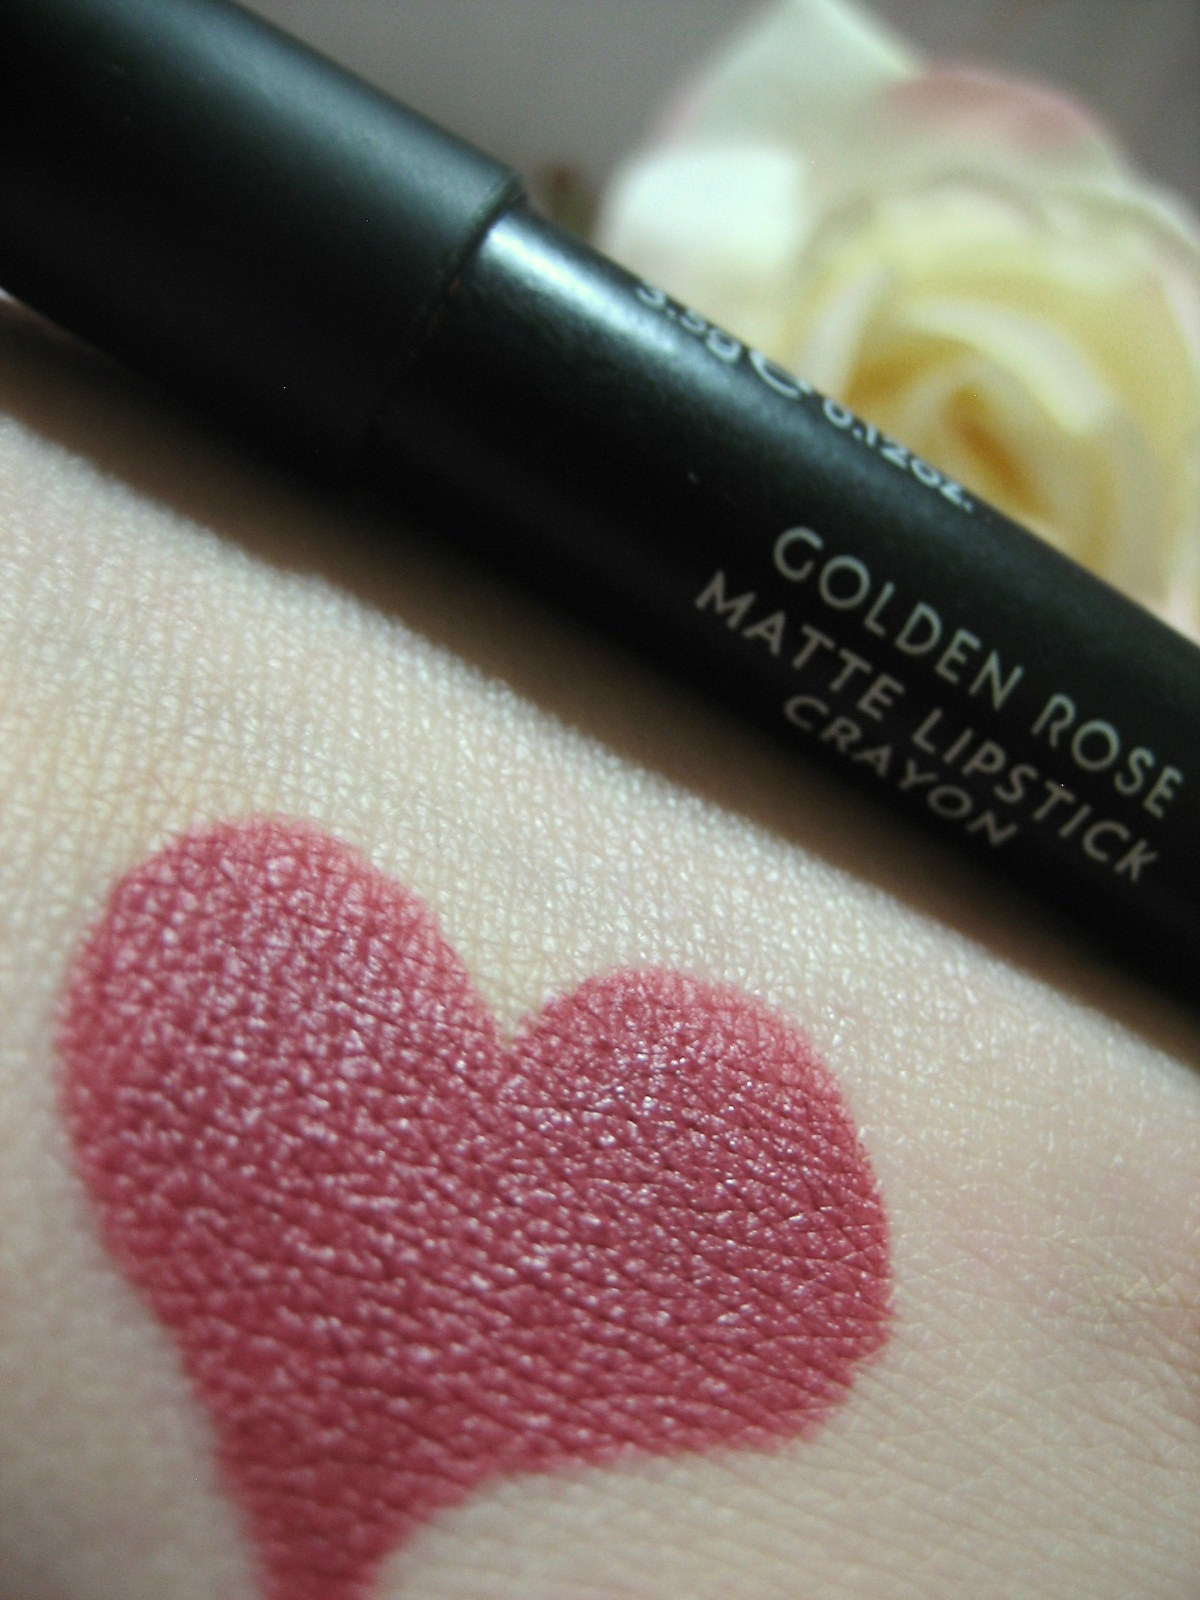 Golden Rose Mat Kalem Ruj Sevdaninzillisi Kozmetik Blogu